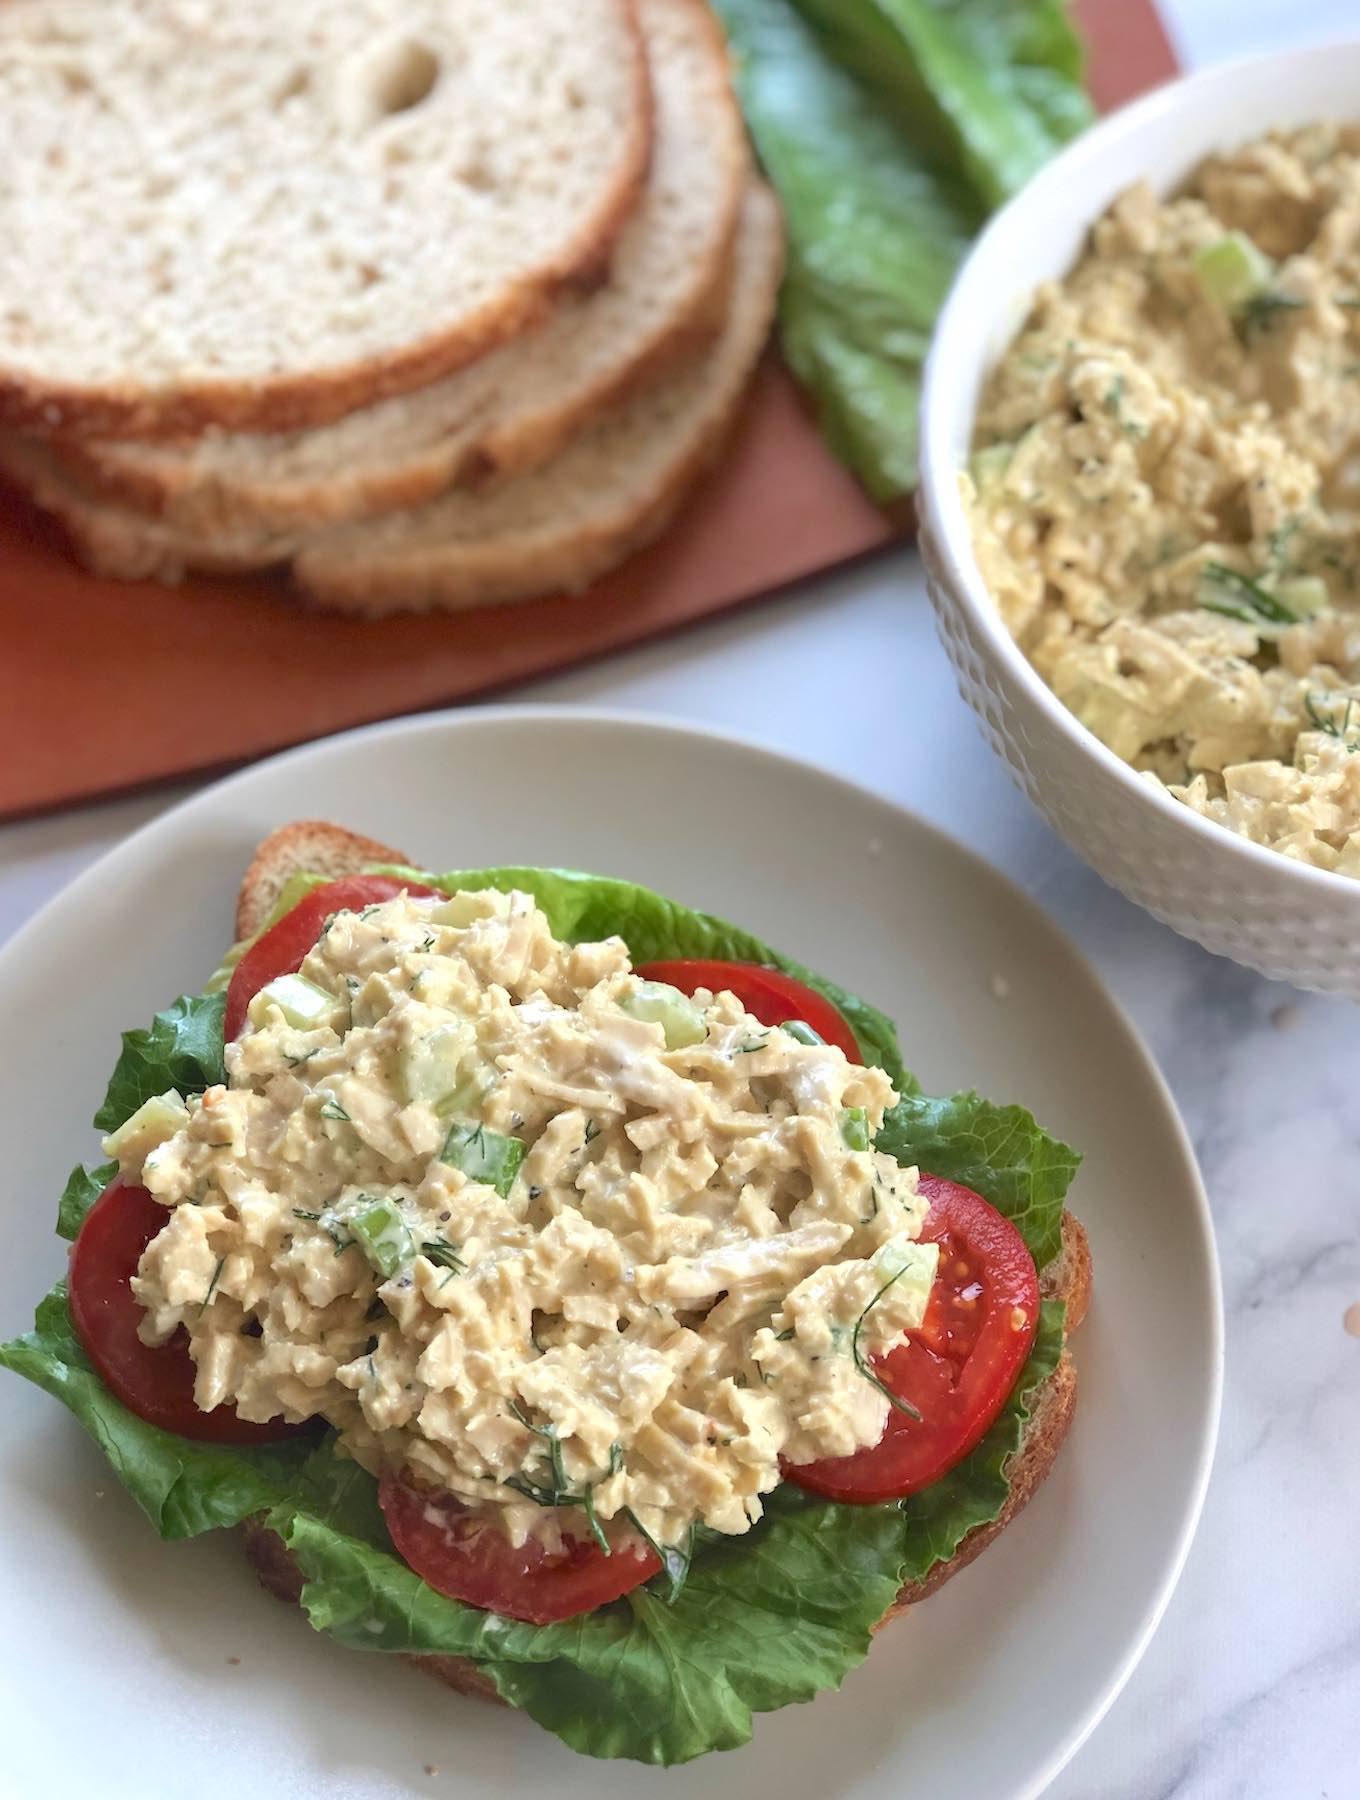 Classic vegan chick'n salad sandwich